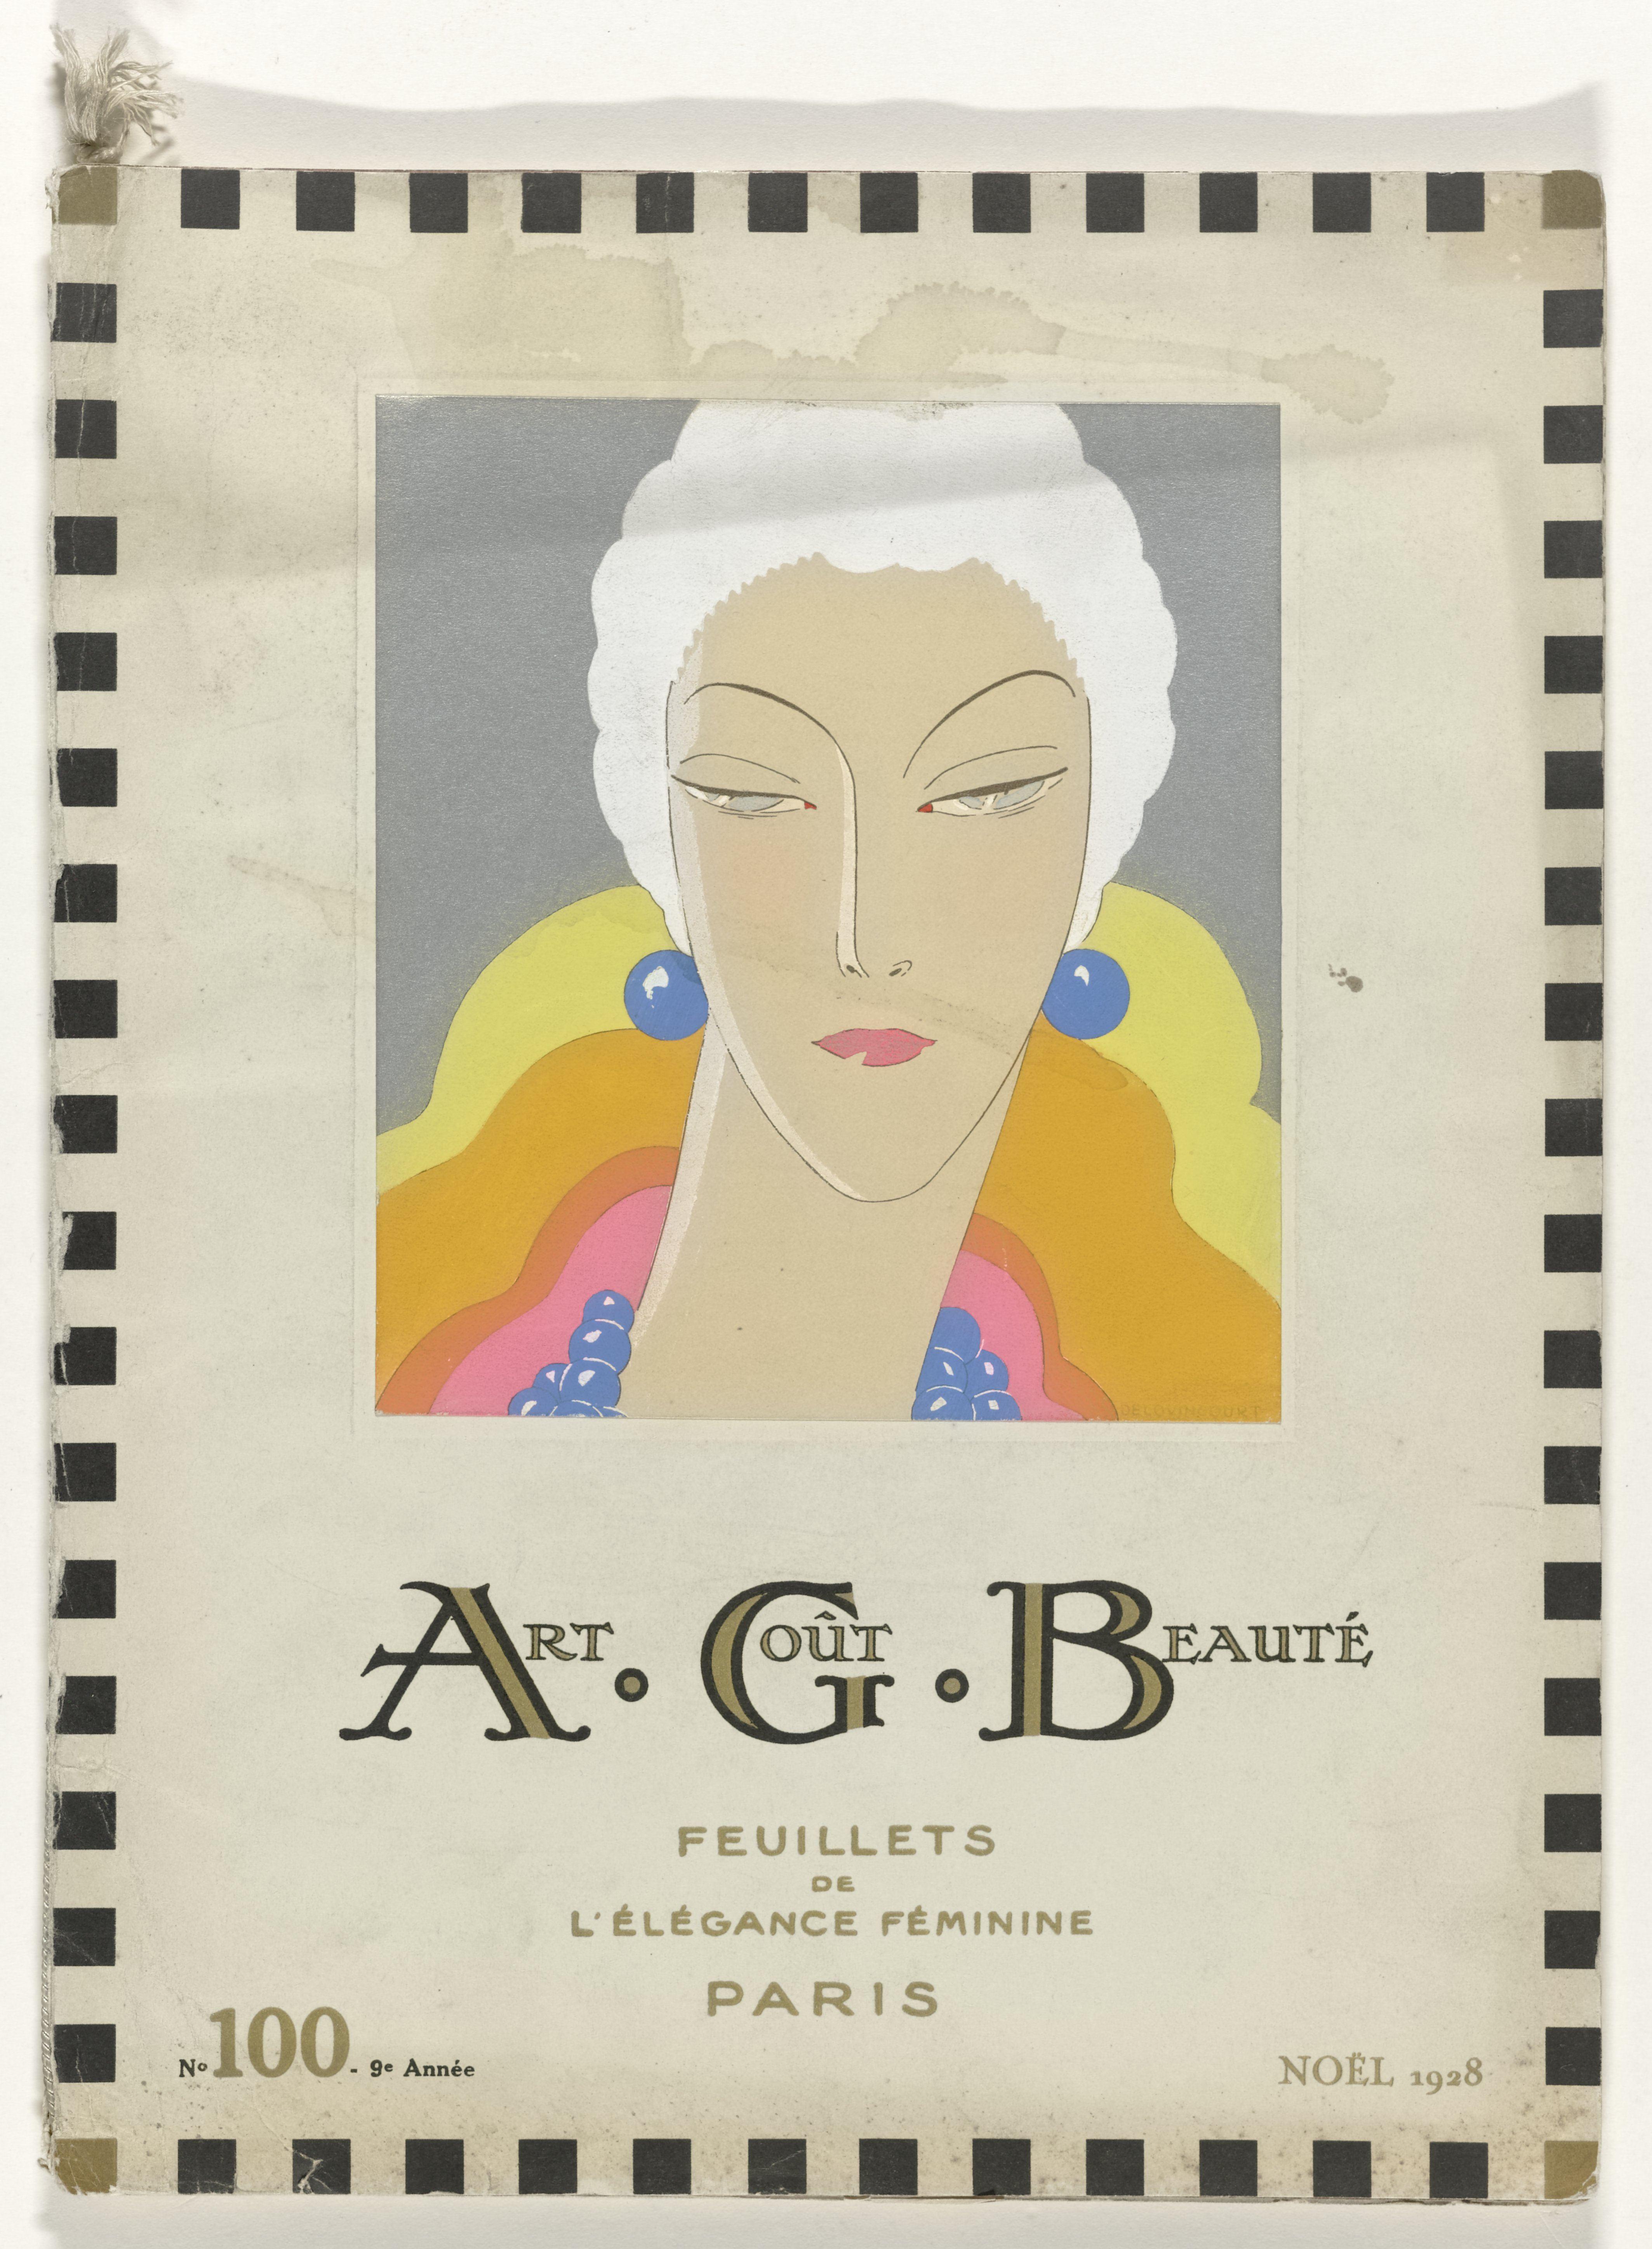 Art – Goût – Beauté magazine No. 100, Christmas 1928 - Fonts In Use